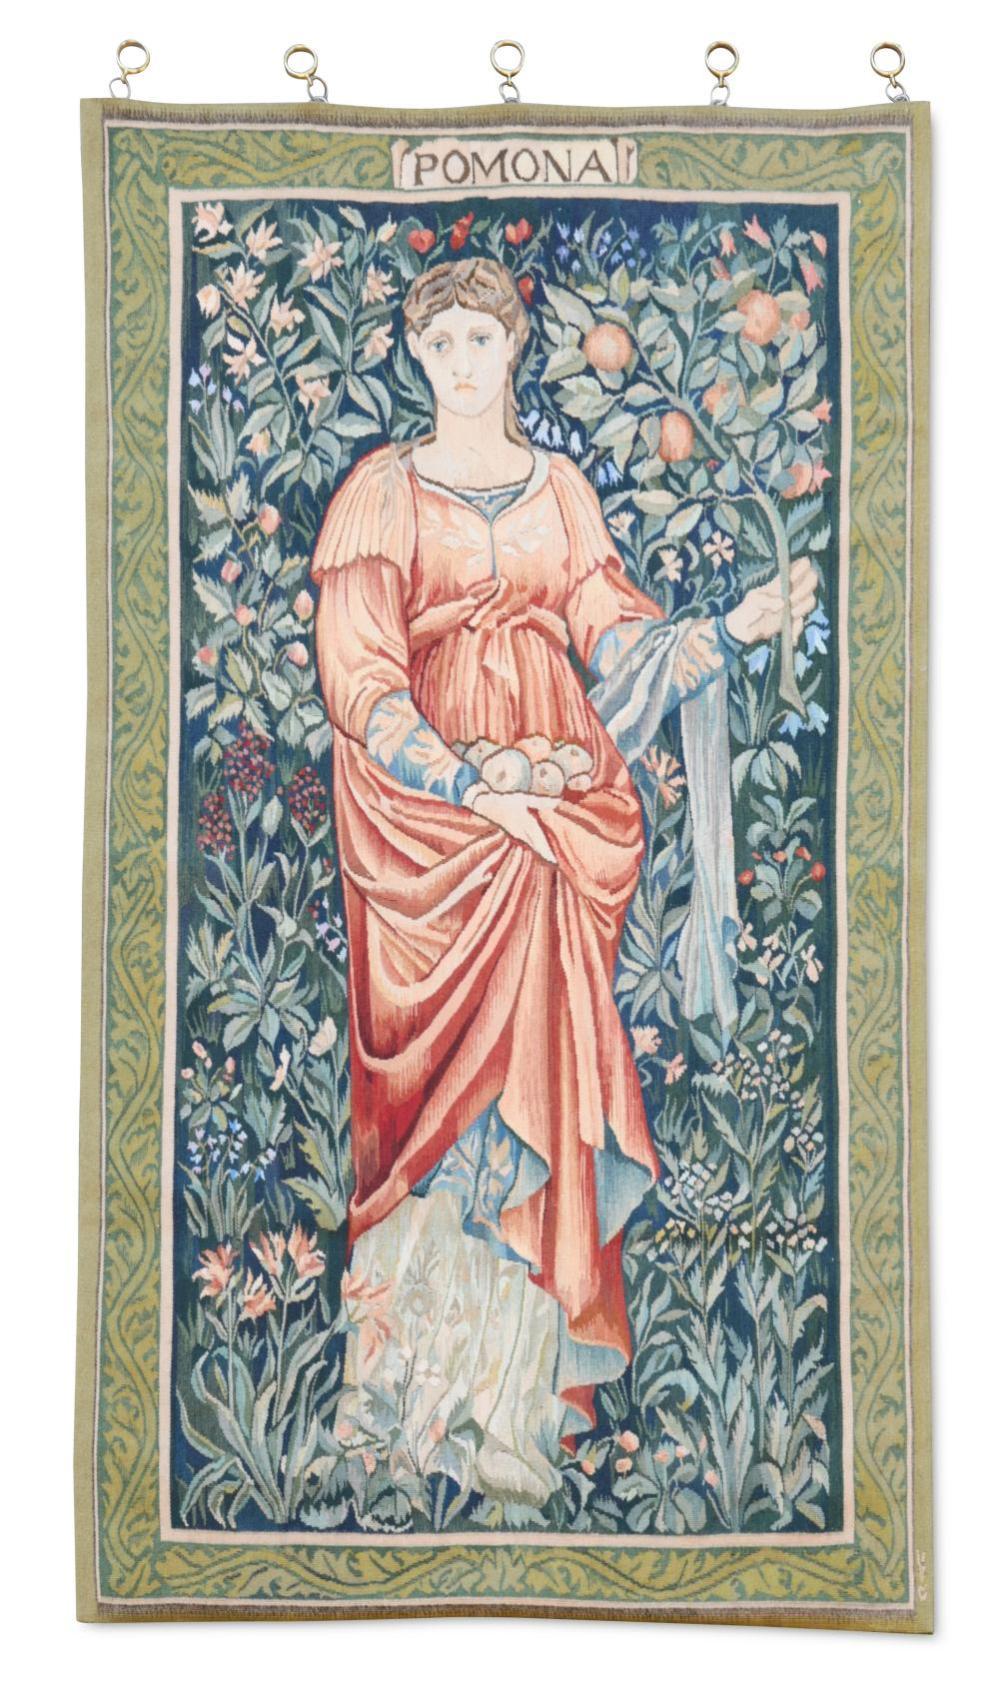 After Burne Jones, Pomona, an Arts & Crafts style needlework hanging, 20th century,